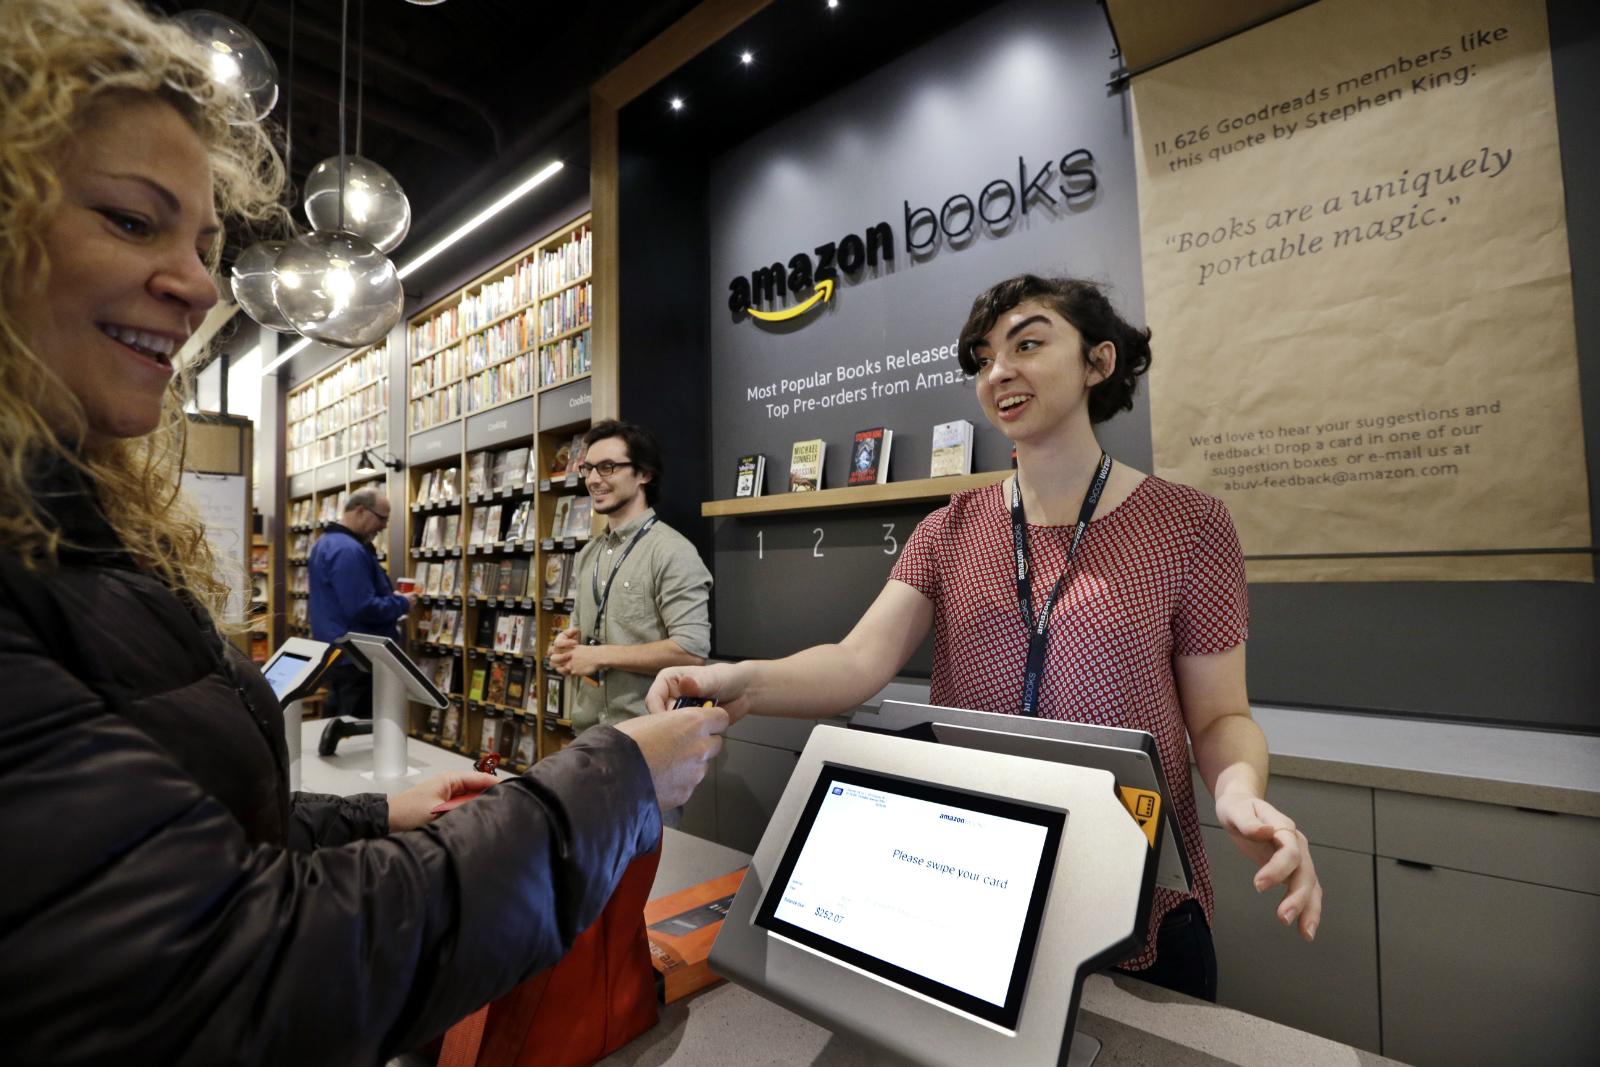 Amazon Prime Perks New Credit Card